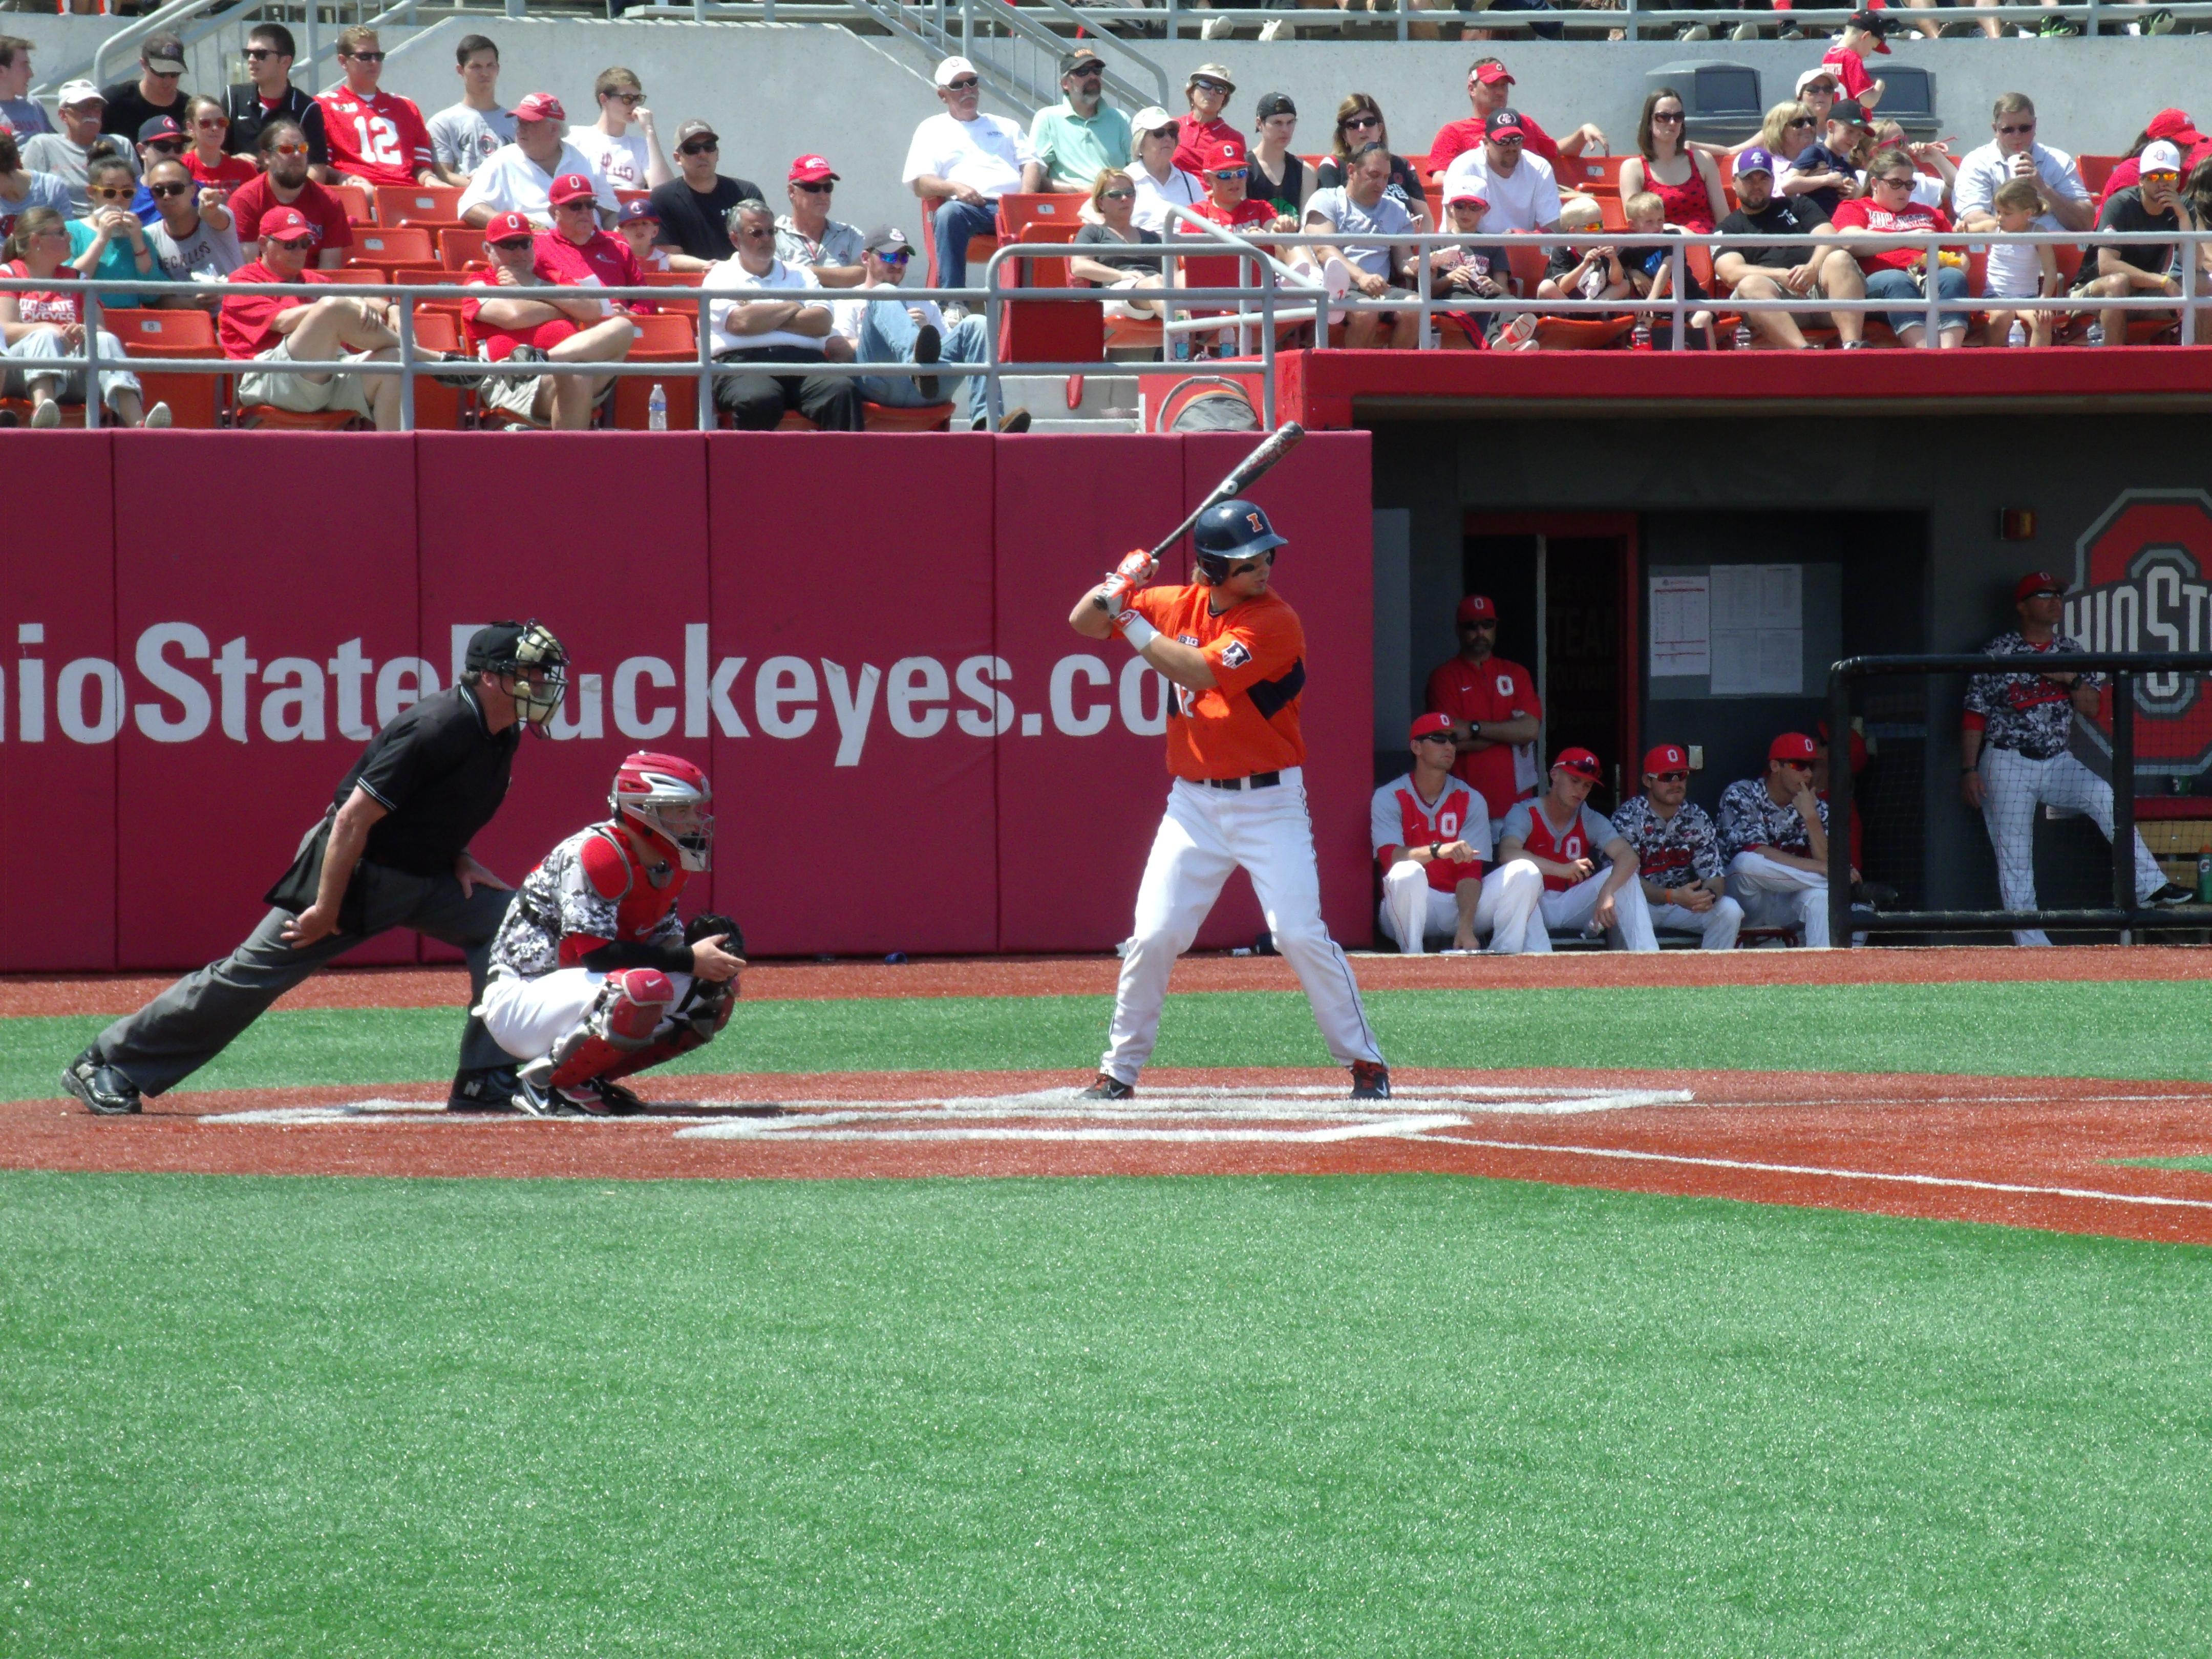 Hitting his Big Ten-leading 11th home run, Illinois senior first baseman led the Illini to a 6-2 win